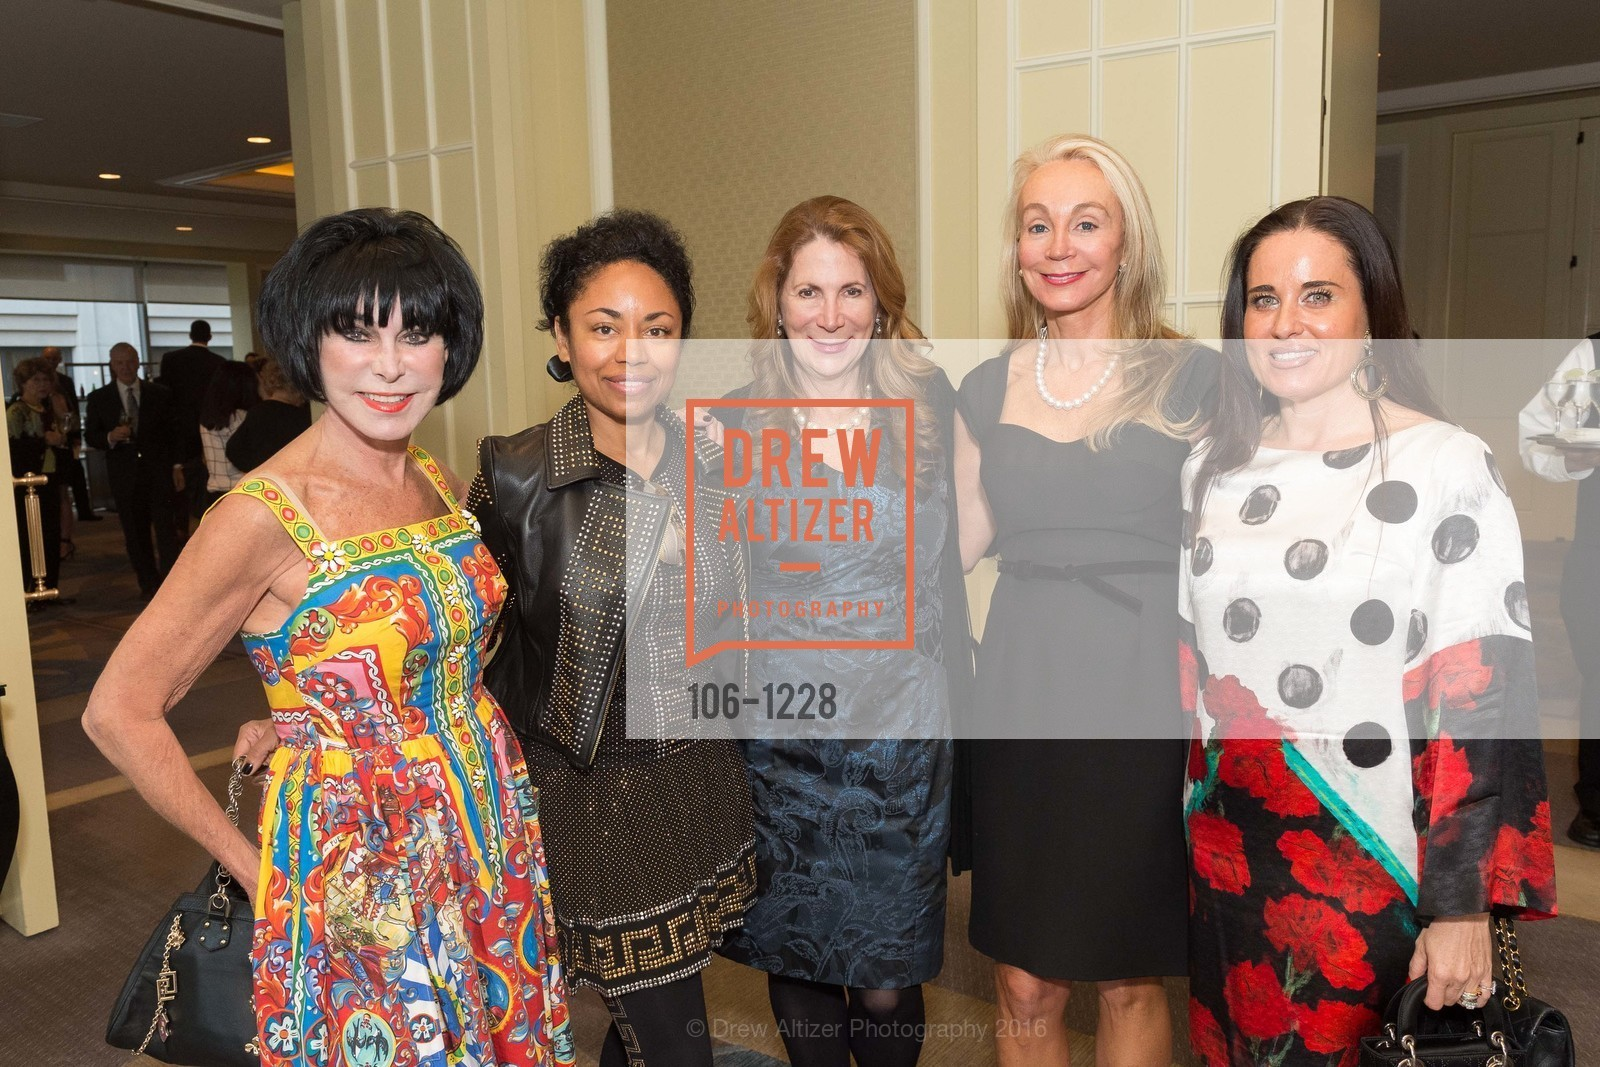 Marilyn Cabak, Tanya Powell, Patricia Ferrin Loucks, Giselle Anna Parry, Natalia Urrutia, Photo #106-1228